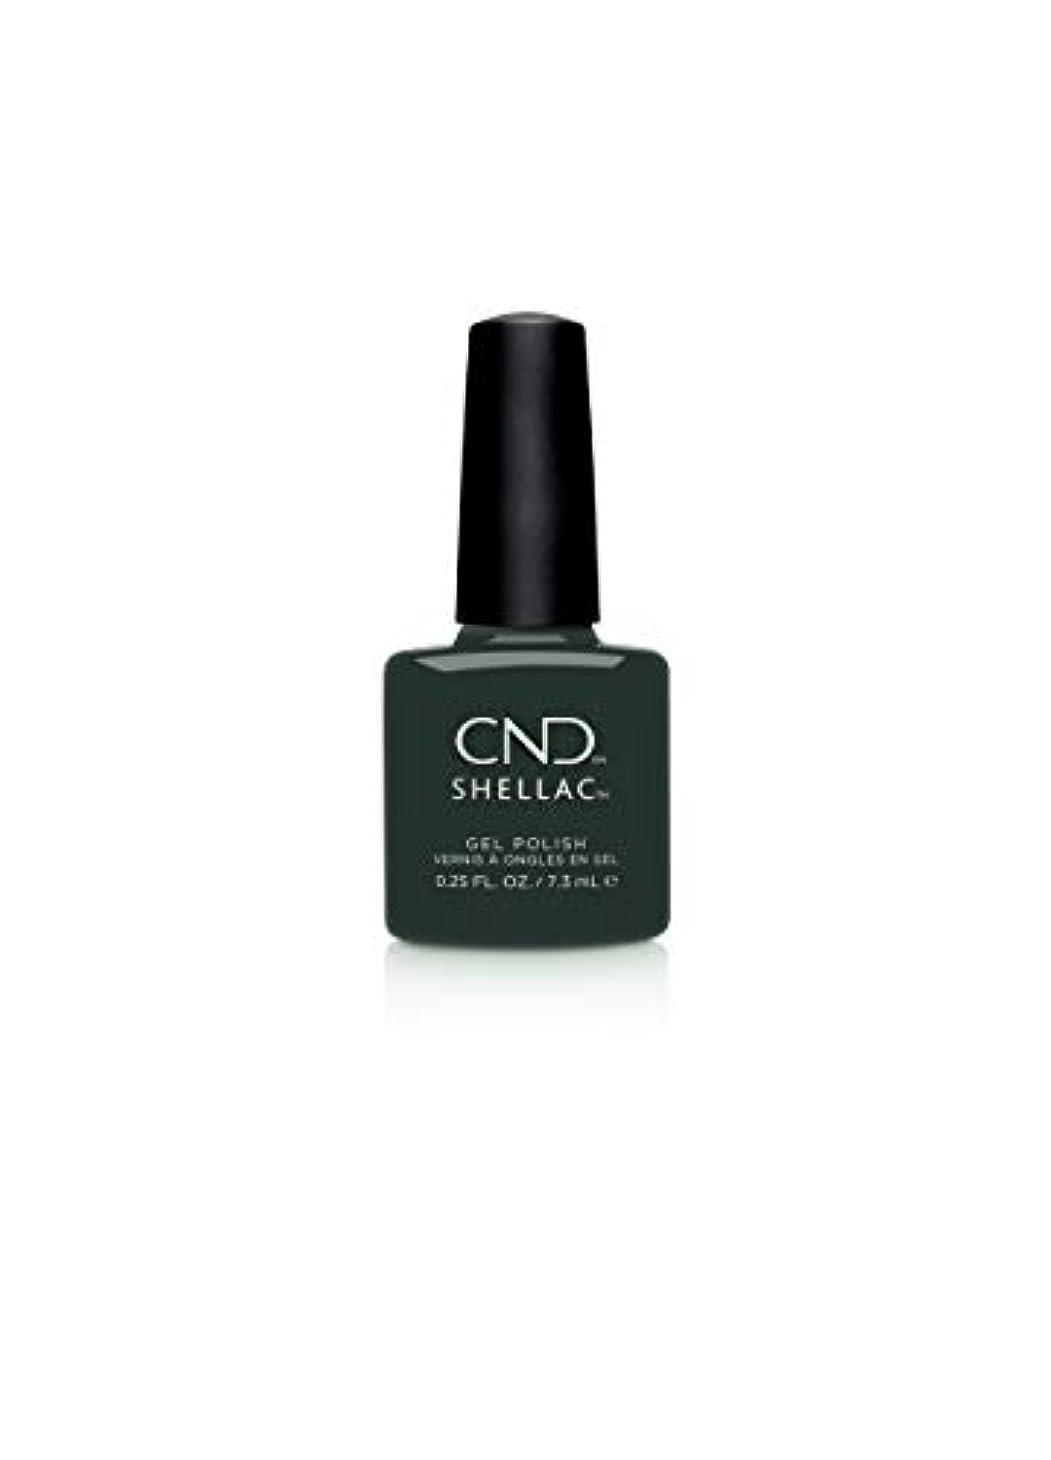 CND Shellac - Prismatic Collection - Aura - 7.3ml / 0.25oz